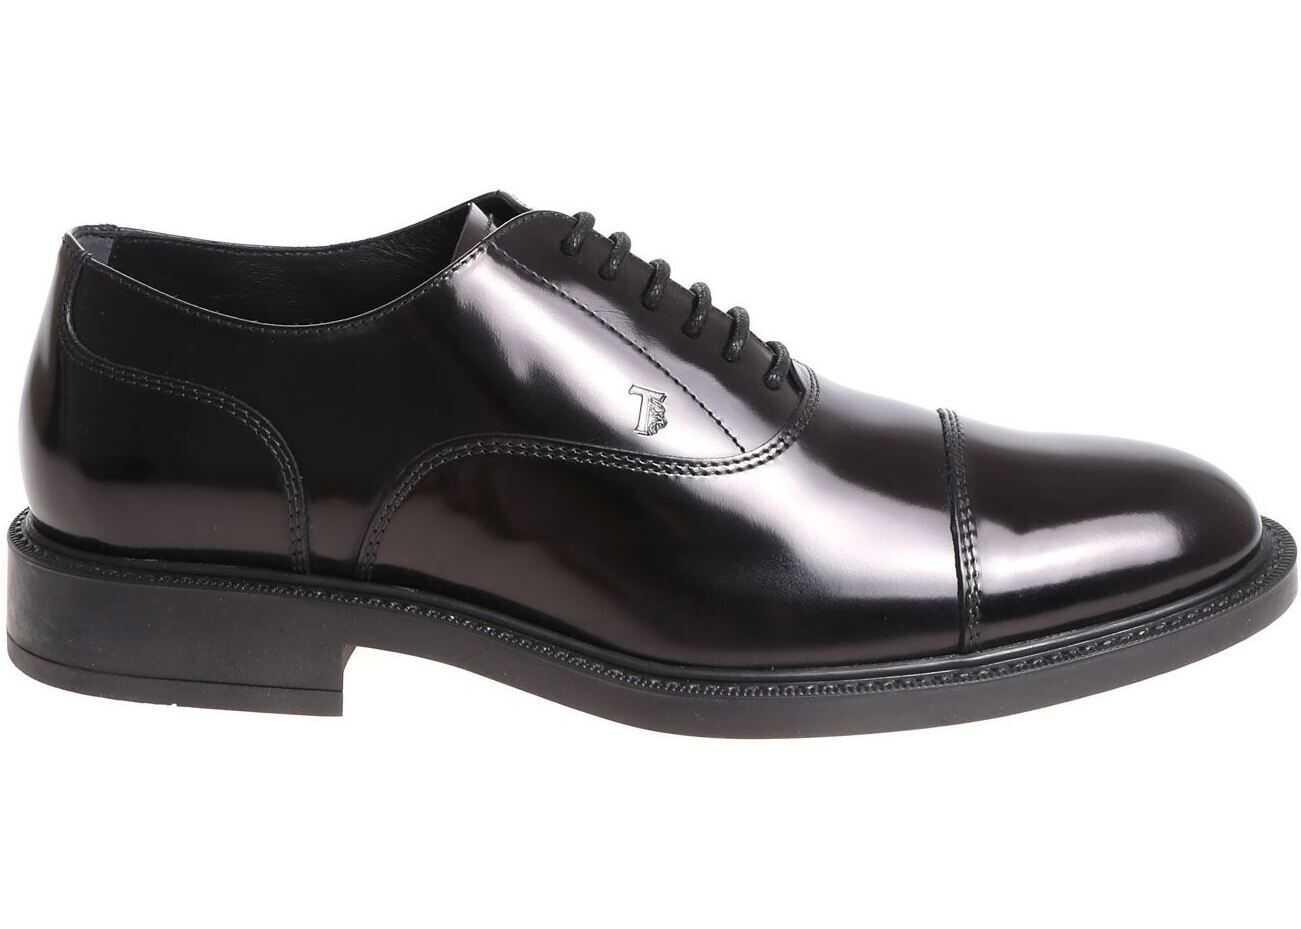 TOD'S Black Leather Oxford Shoes XXM45A00N50AKTB999 Black imagine b-mall.ro